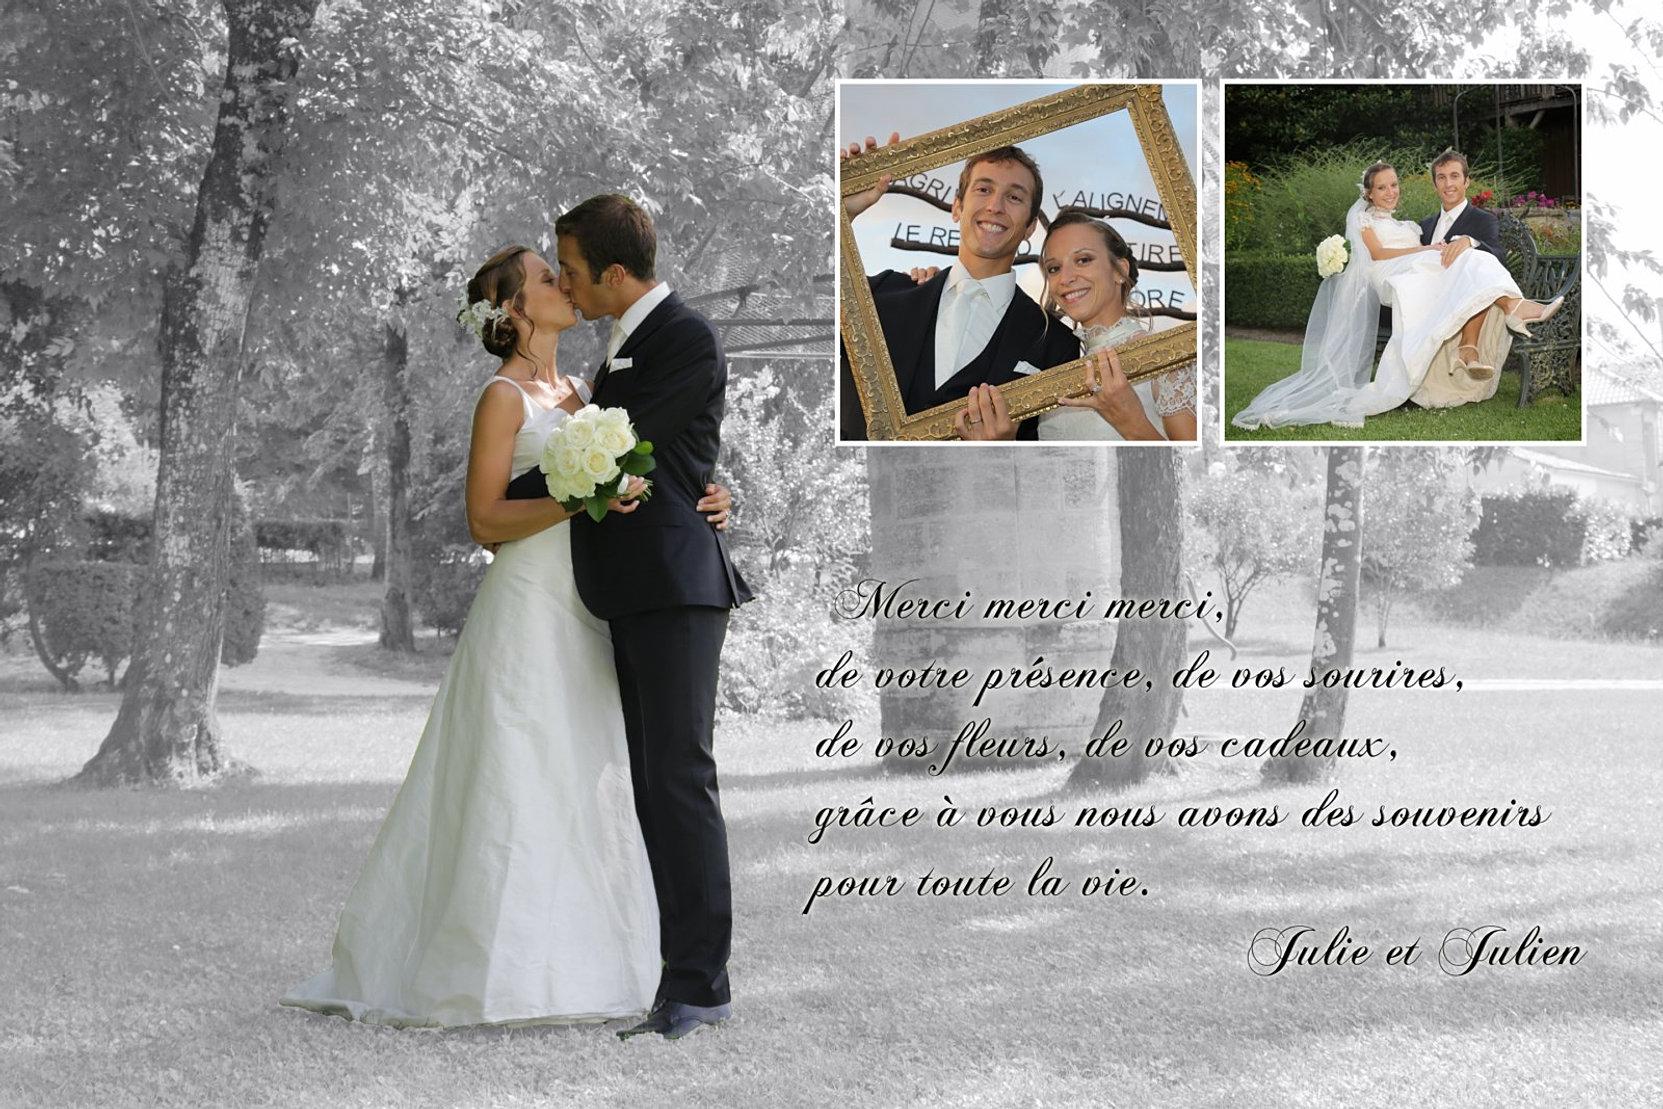 photos equivox photographe mariage gironde carte de remerciement. Black Bedroom Furniture Sets. Home Design Ideas